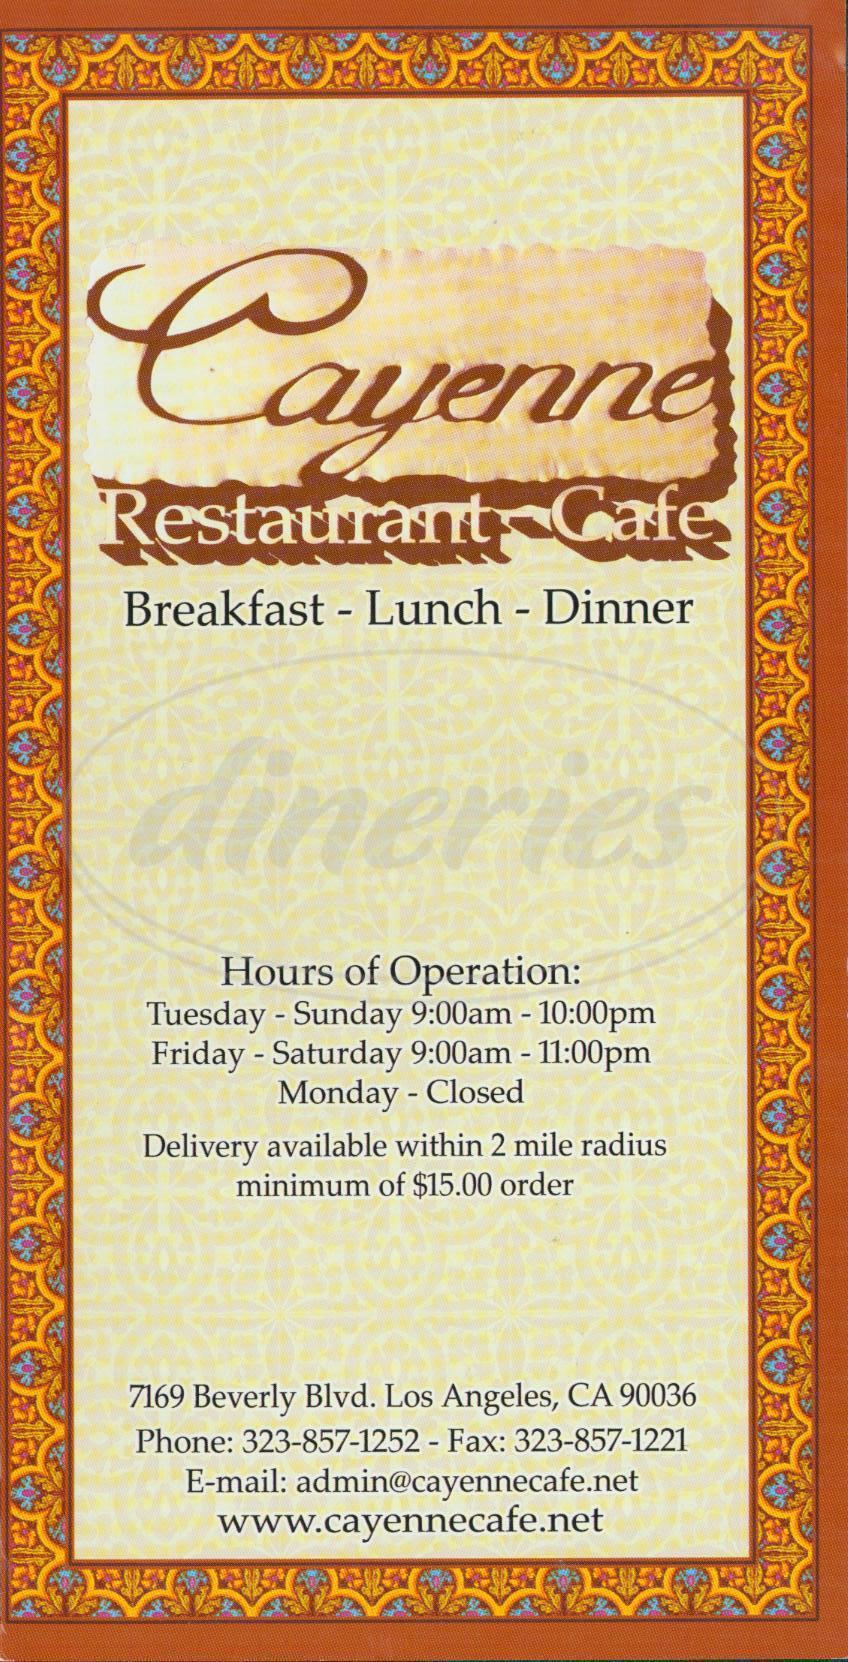 menu for Cayenne Café